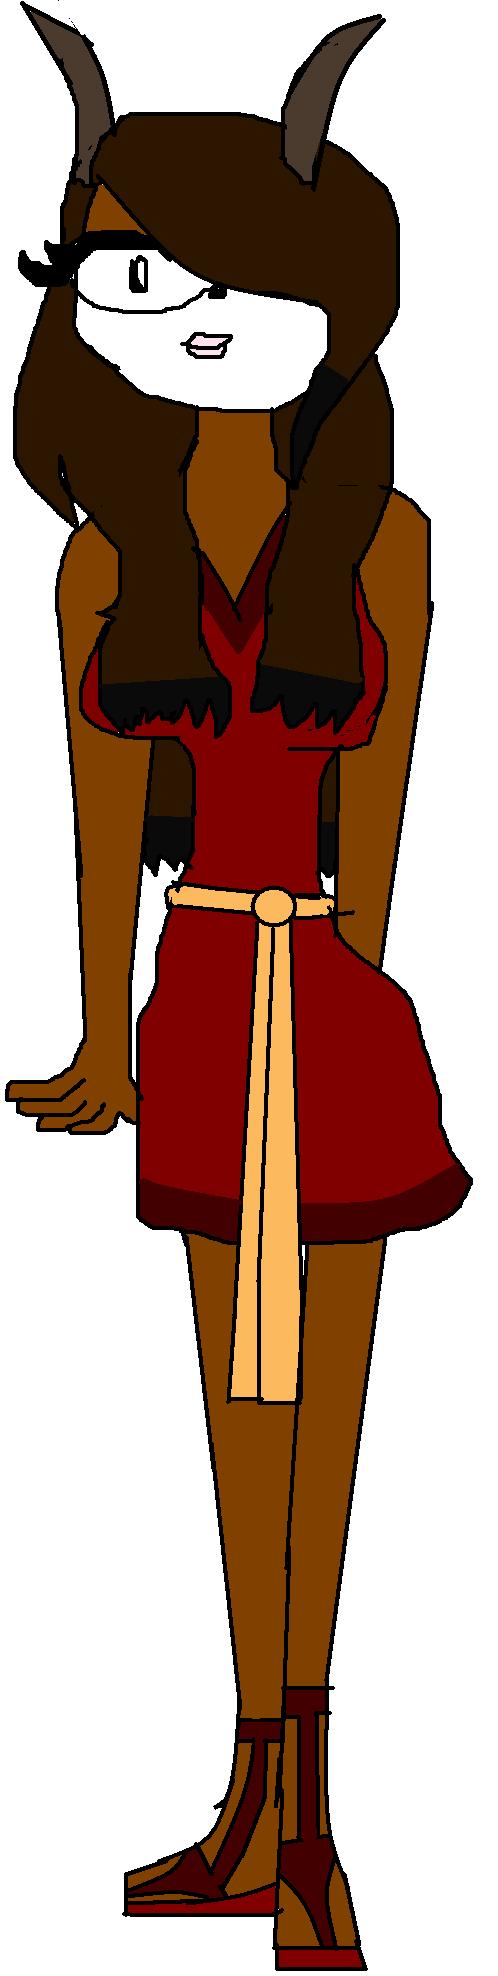 Ramira the Goat